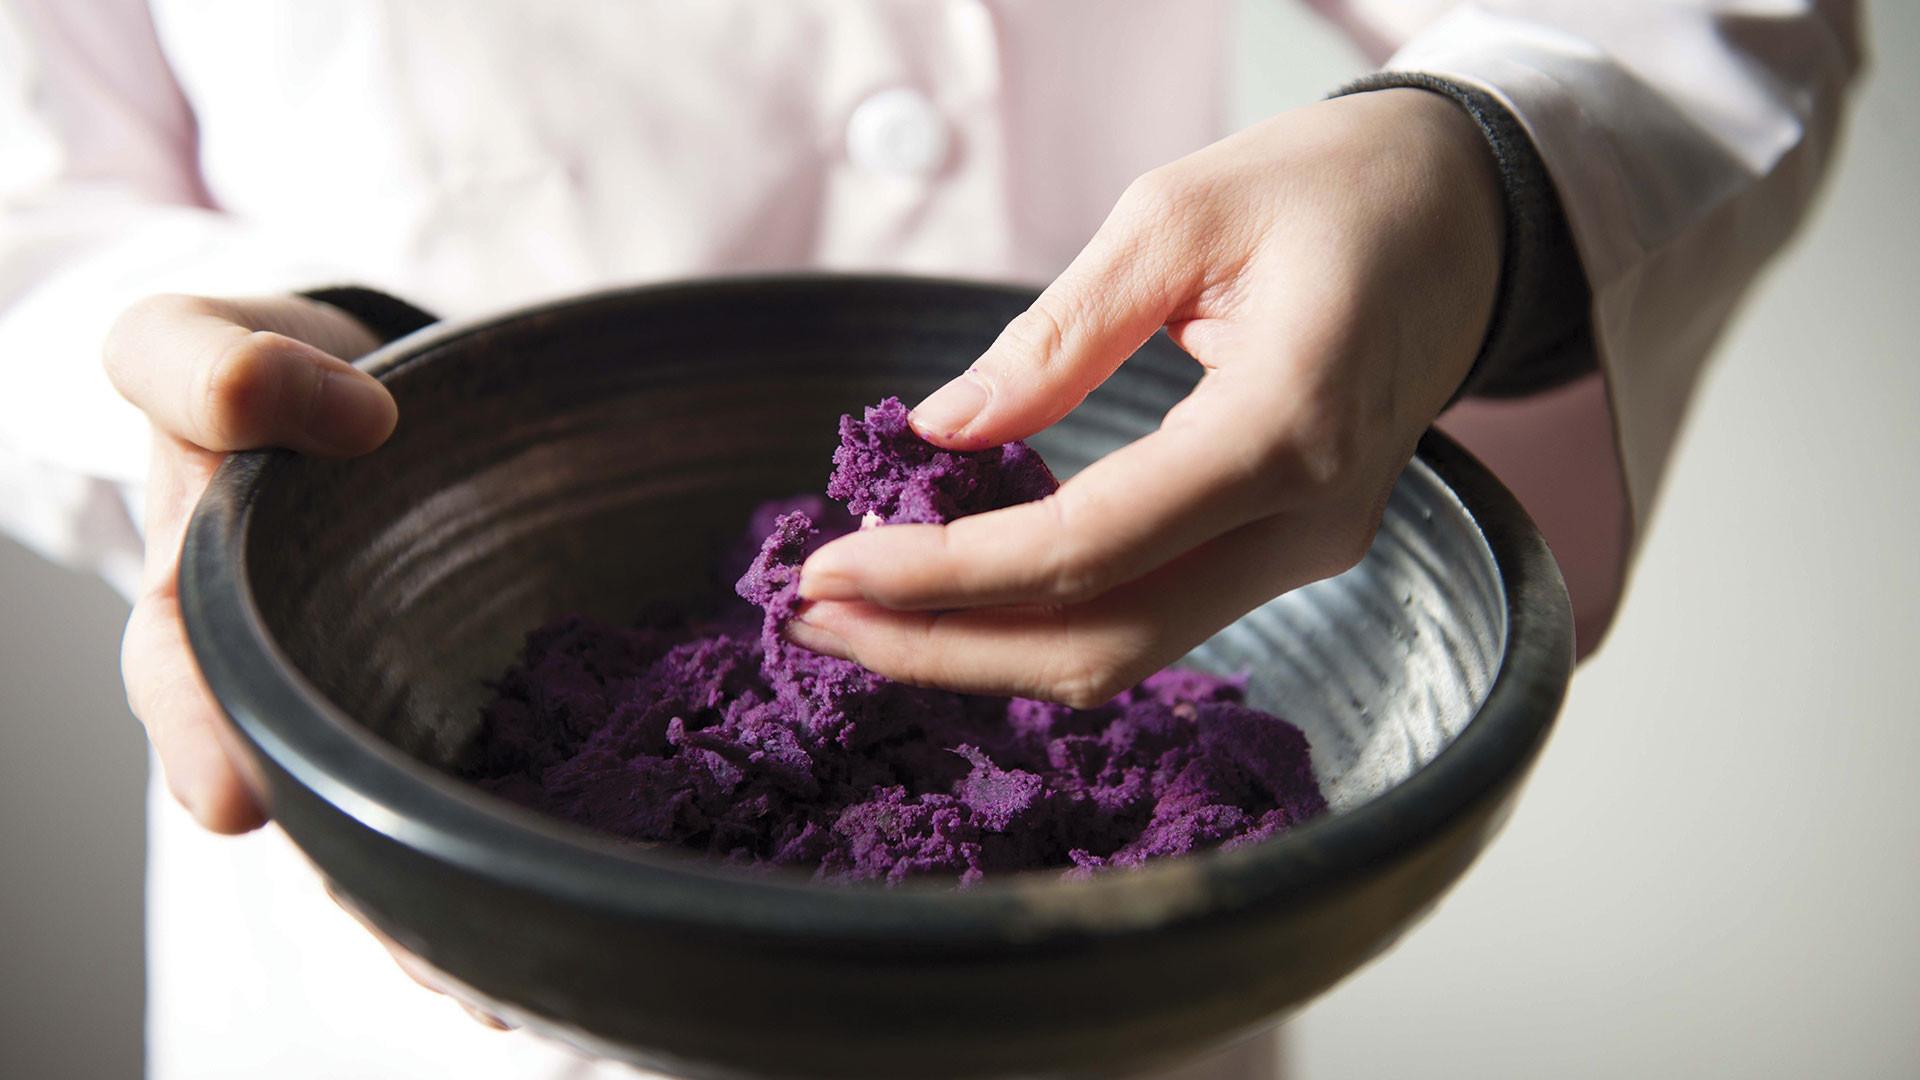 Preparing the main ingredient for shōchū – sweet potato